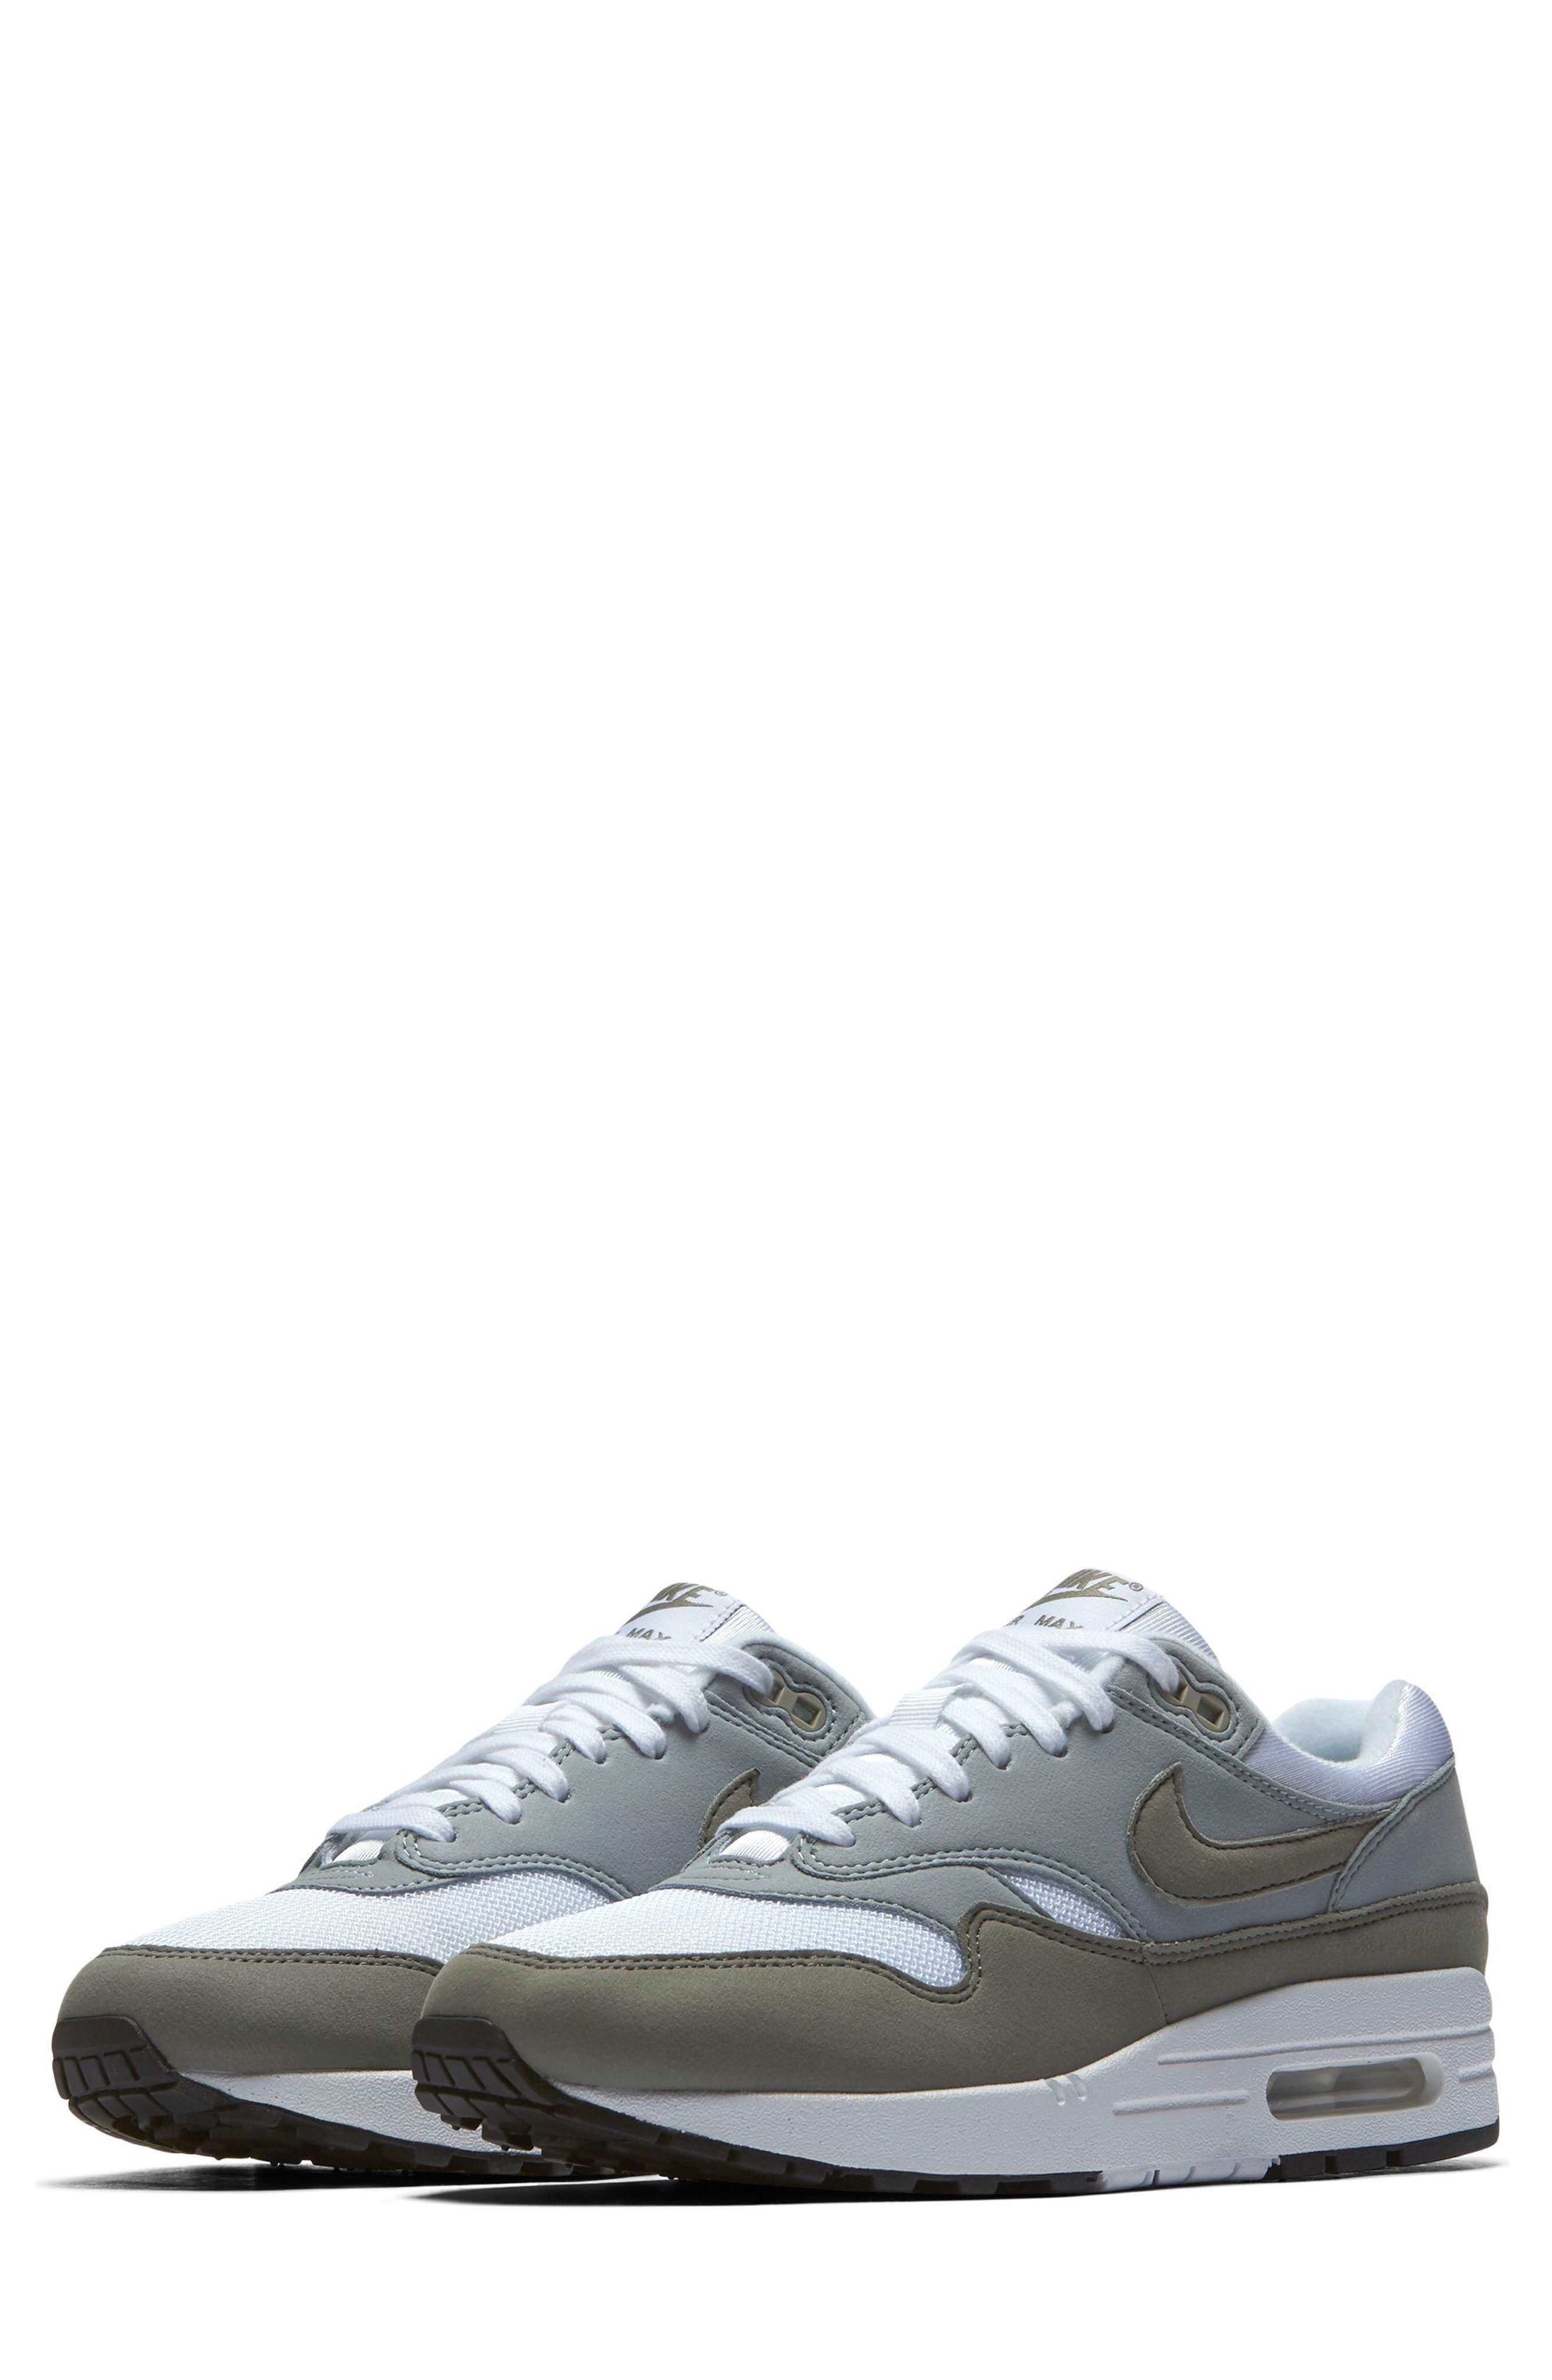 Air Max 1 Sneaker,                         Main,                         color, White/ Dark Stucco